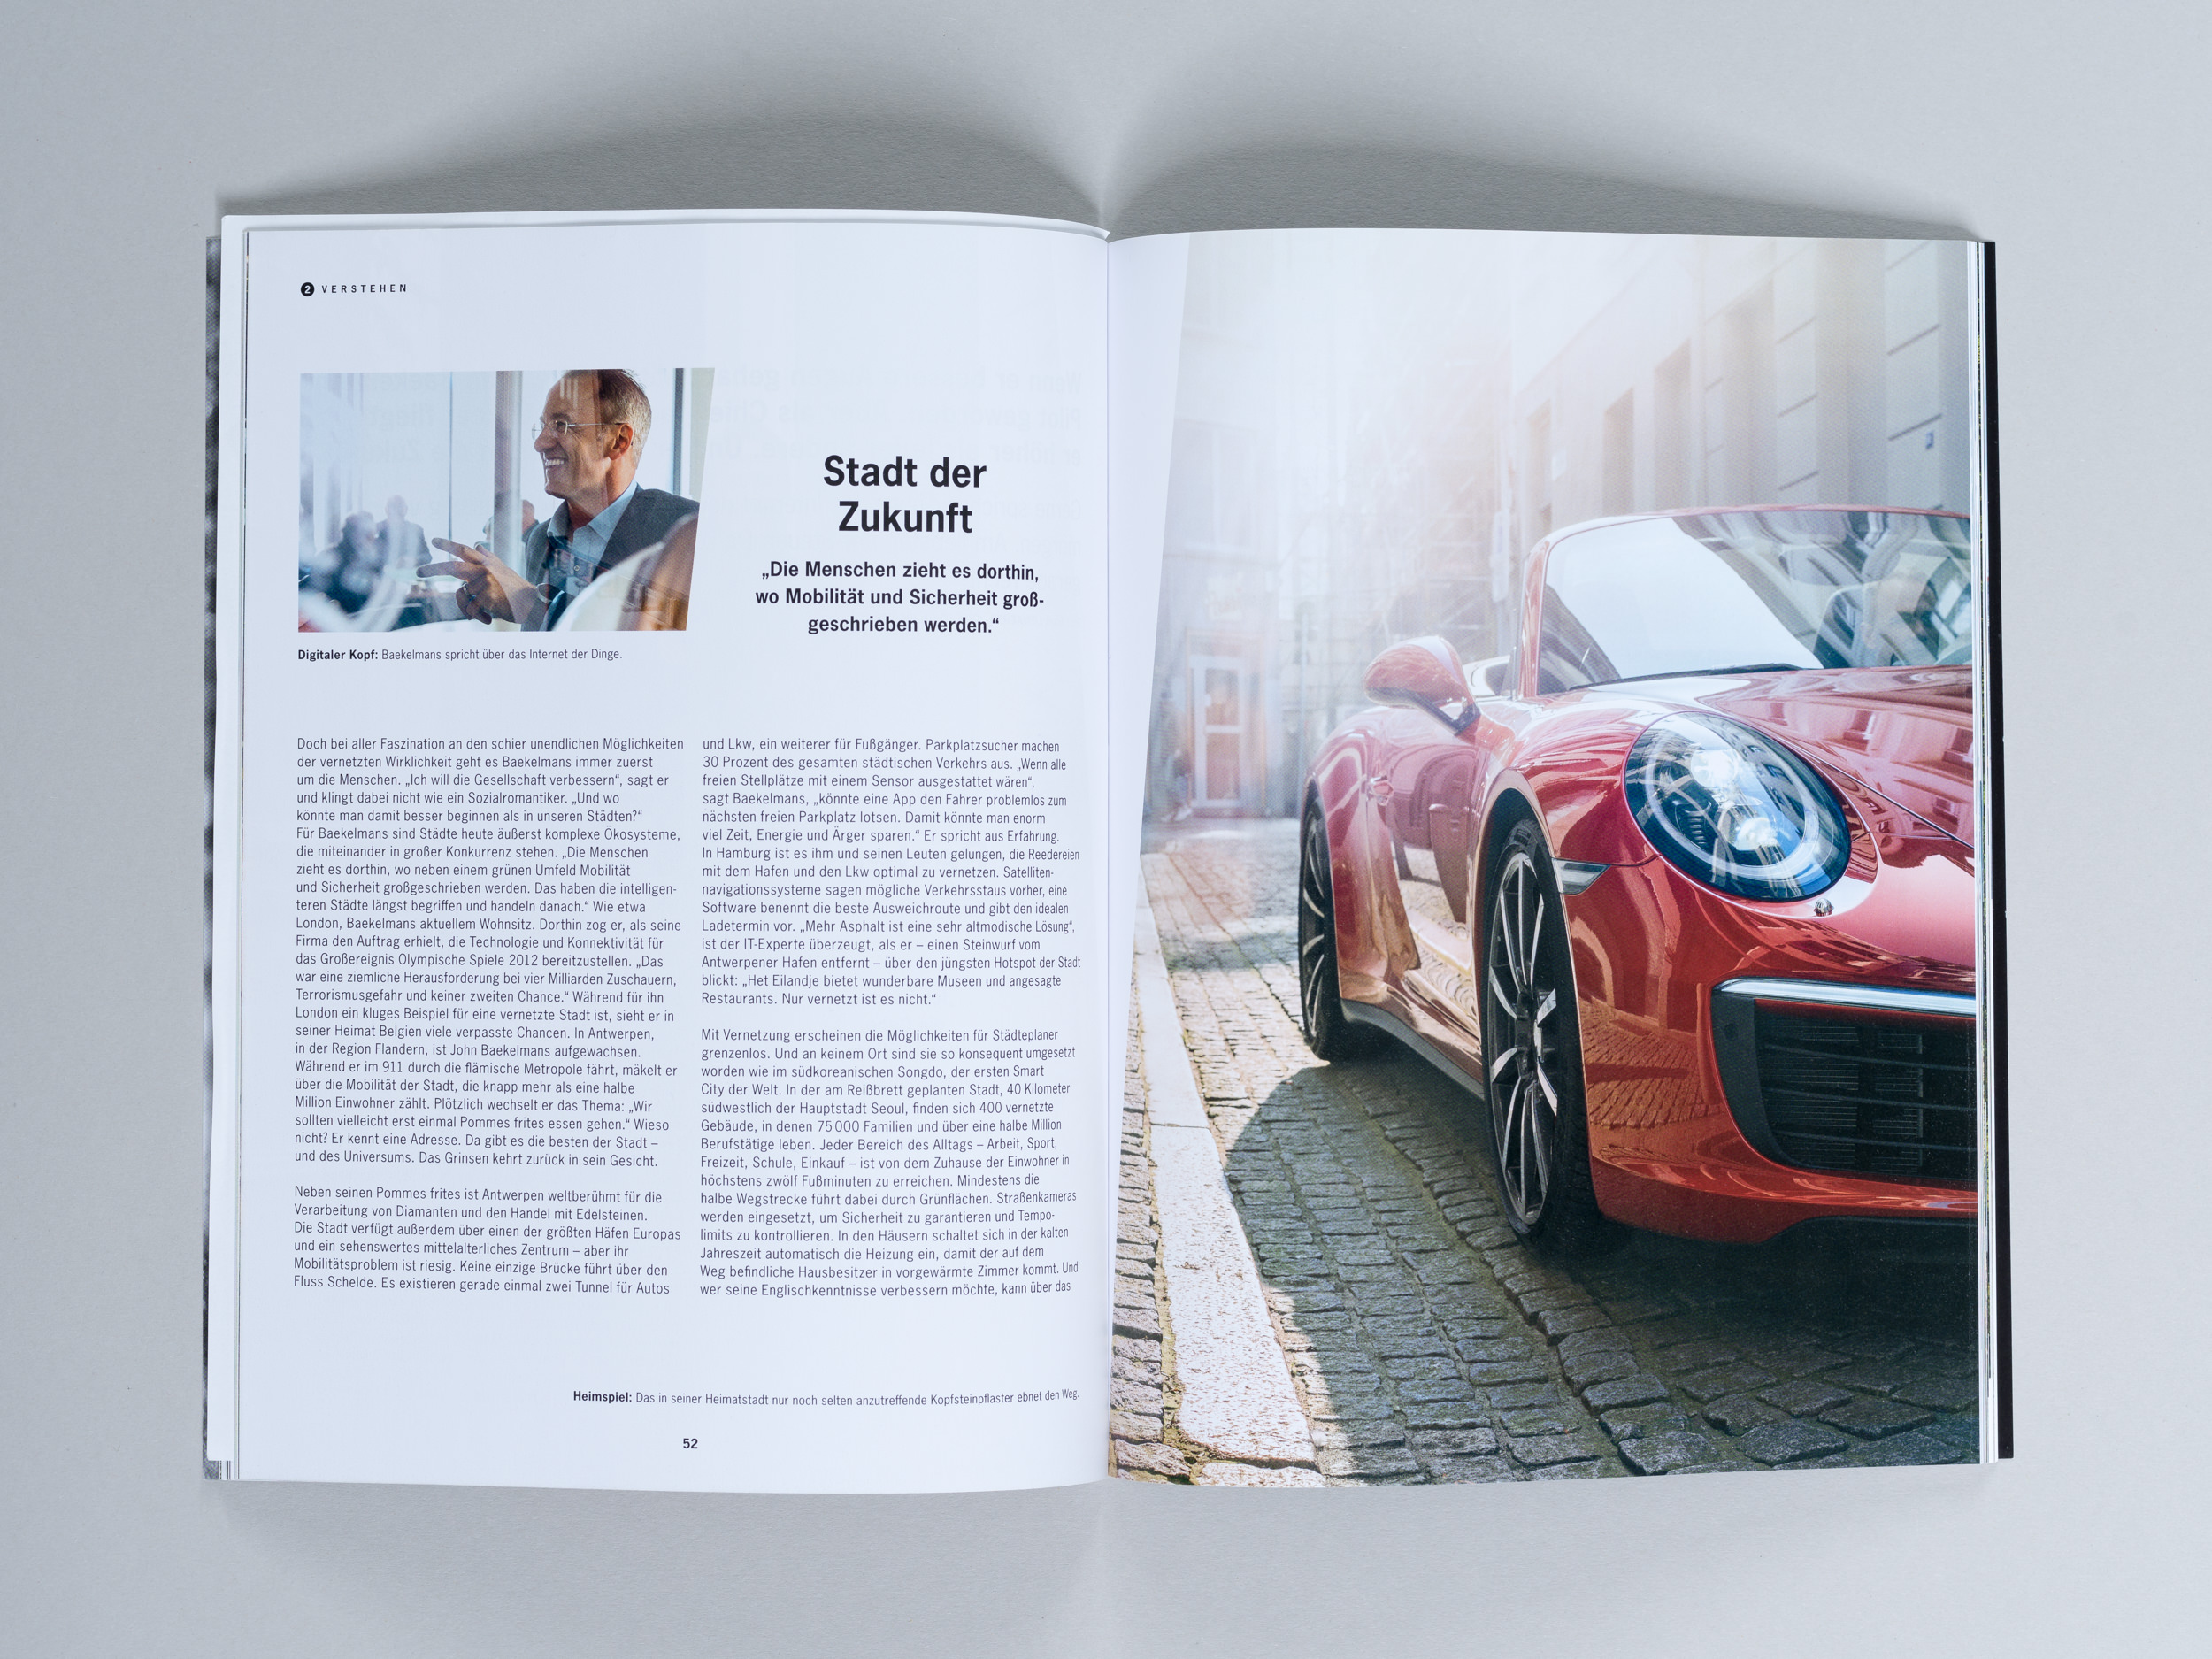 Porsche-Christophorus_Sven-Cichowicz-4482_Fotograf-Stuttgart.JPG